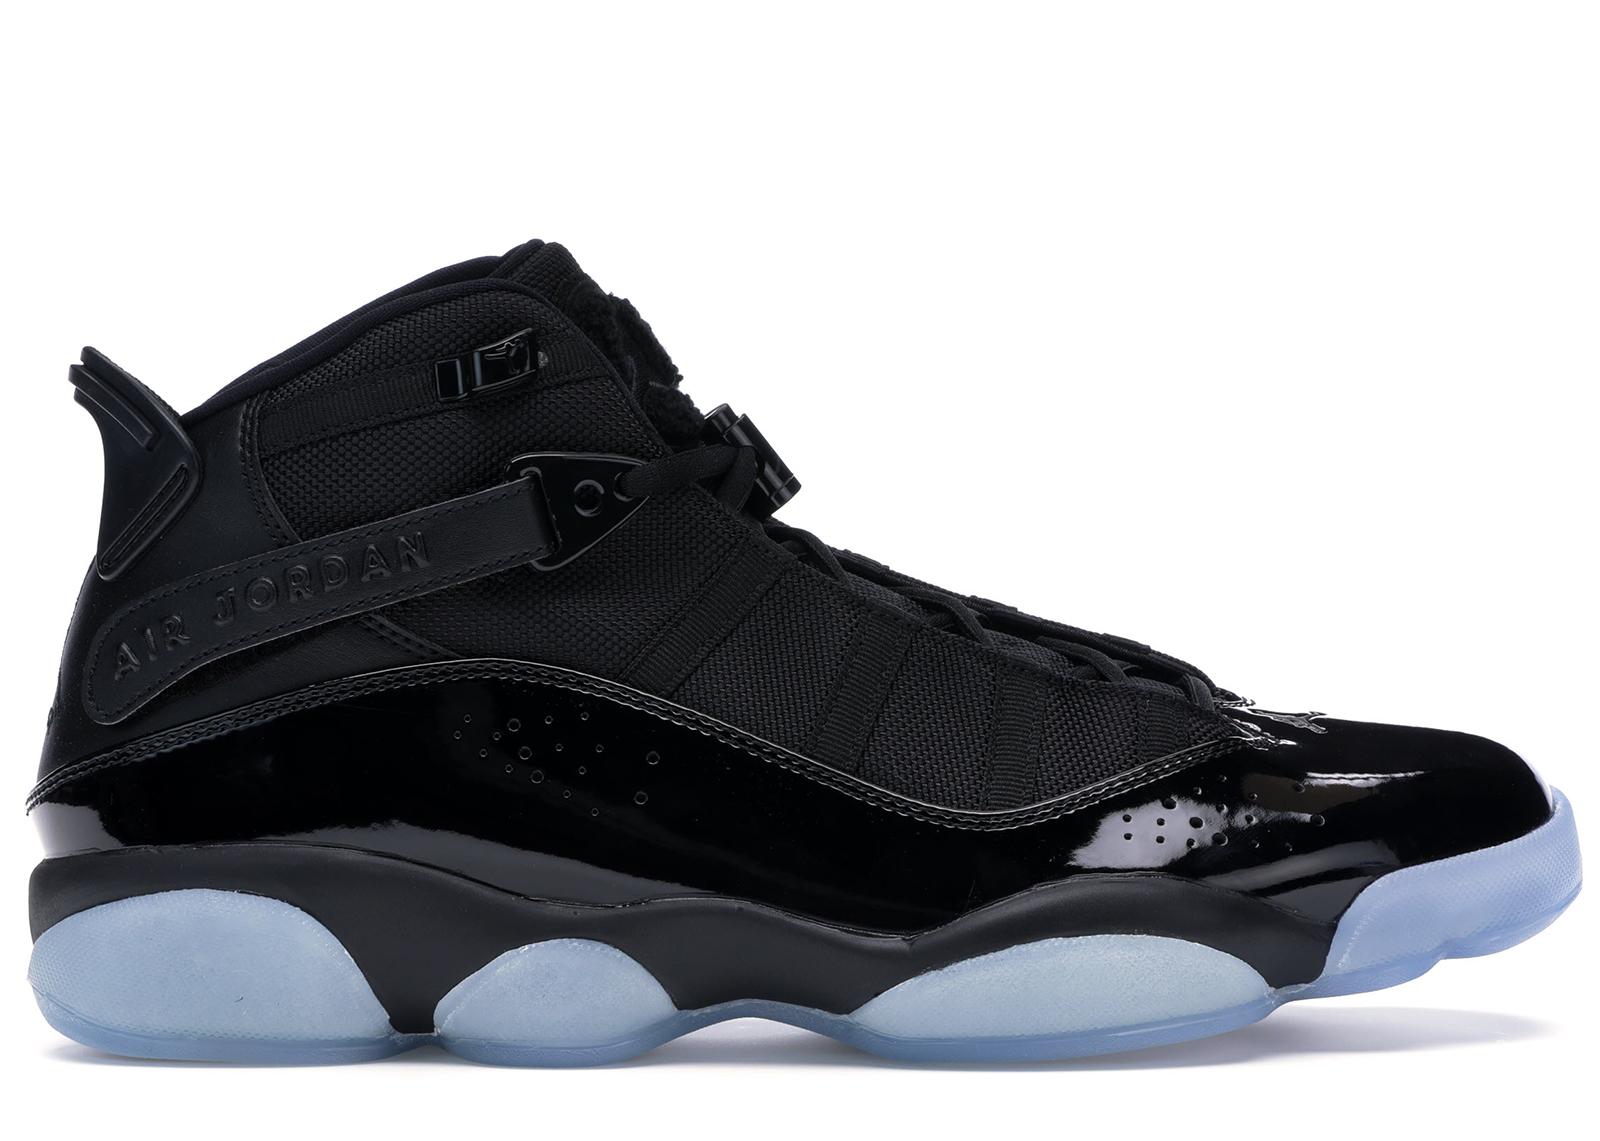 Jordan 6 Rings Black Ice - 322992-011